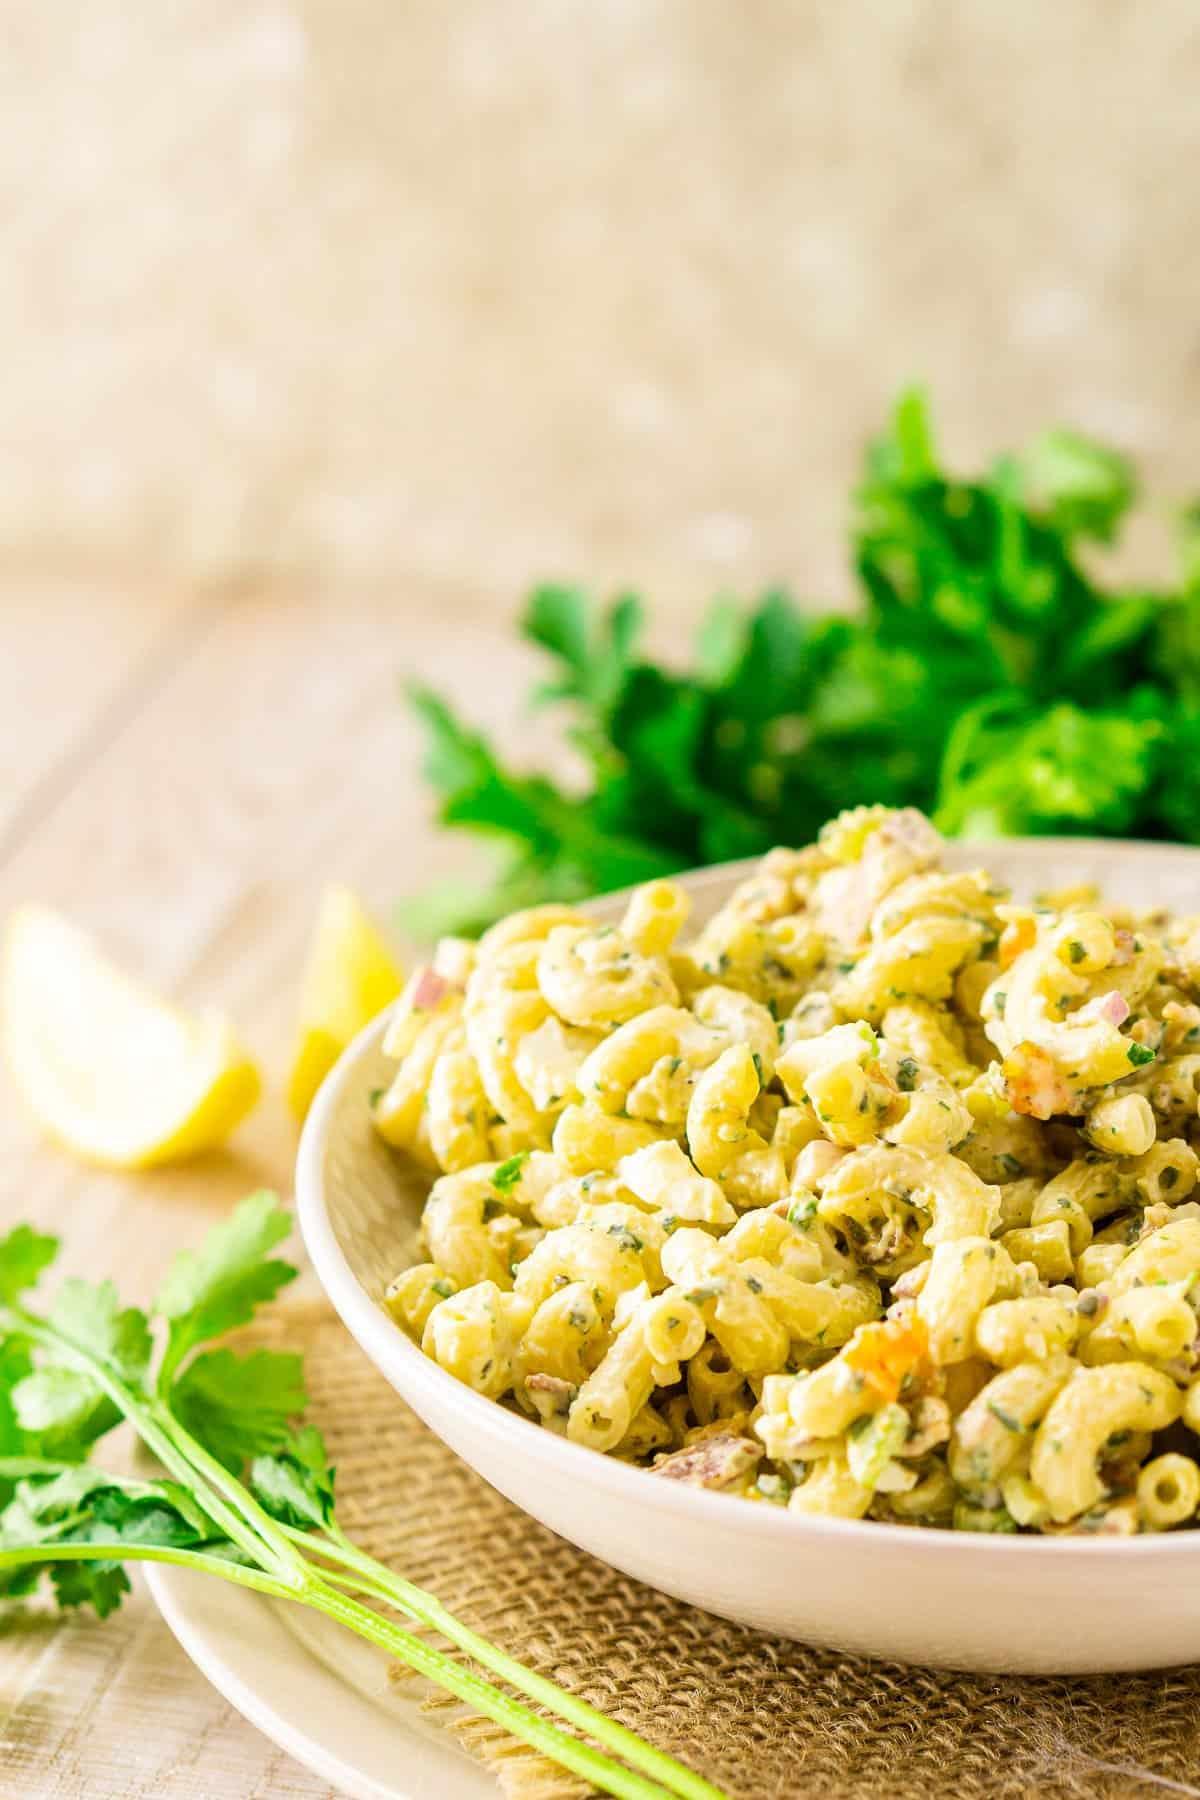 A bowl of macaroni salad on burlap.